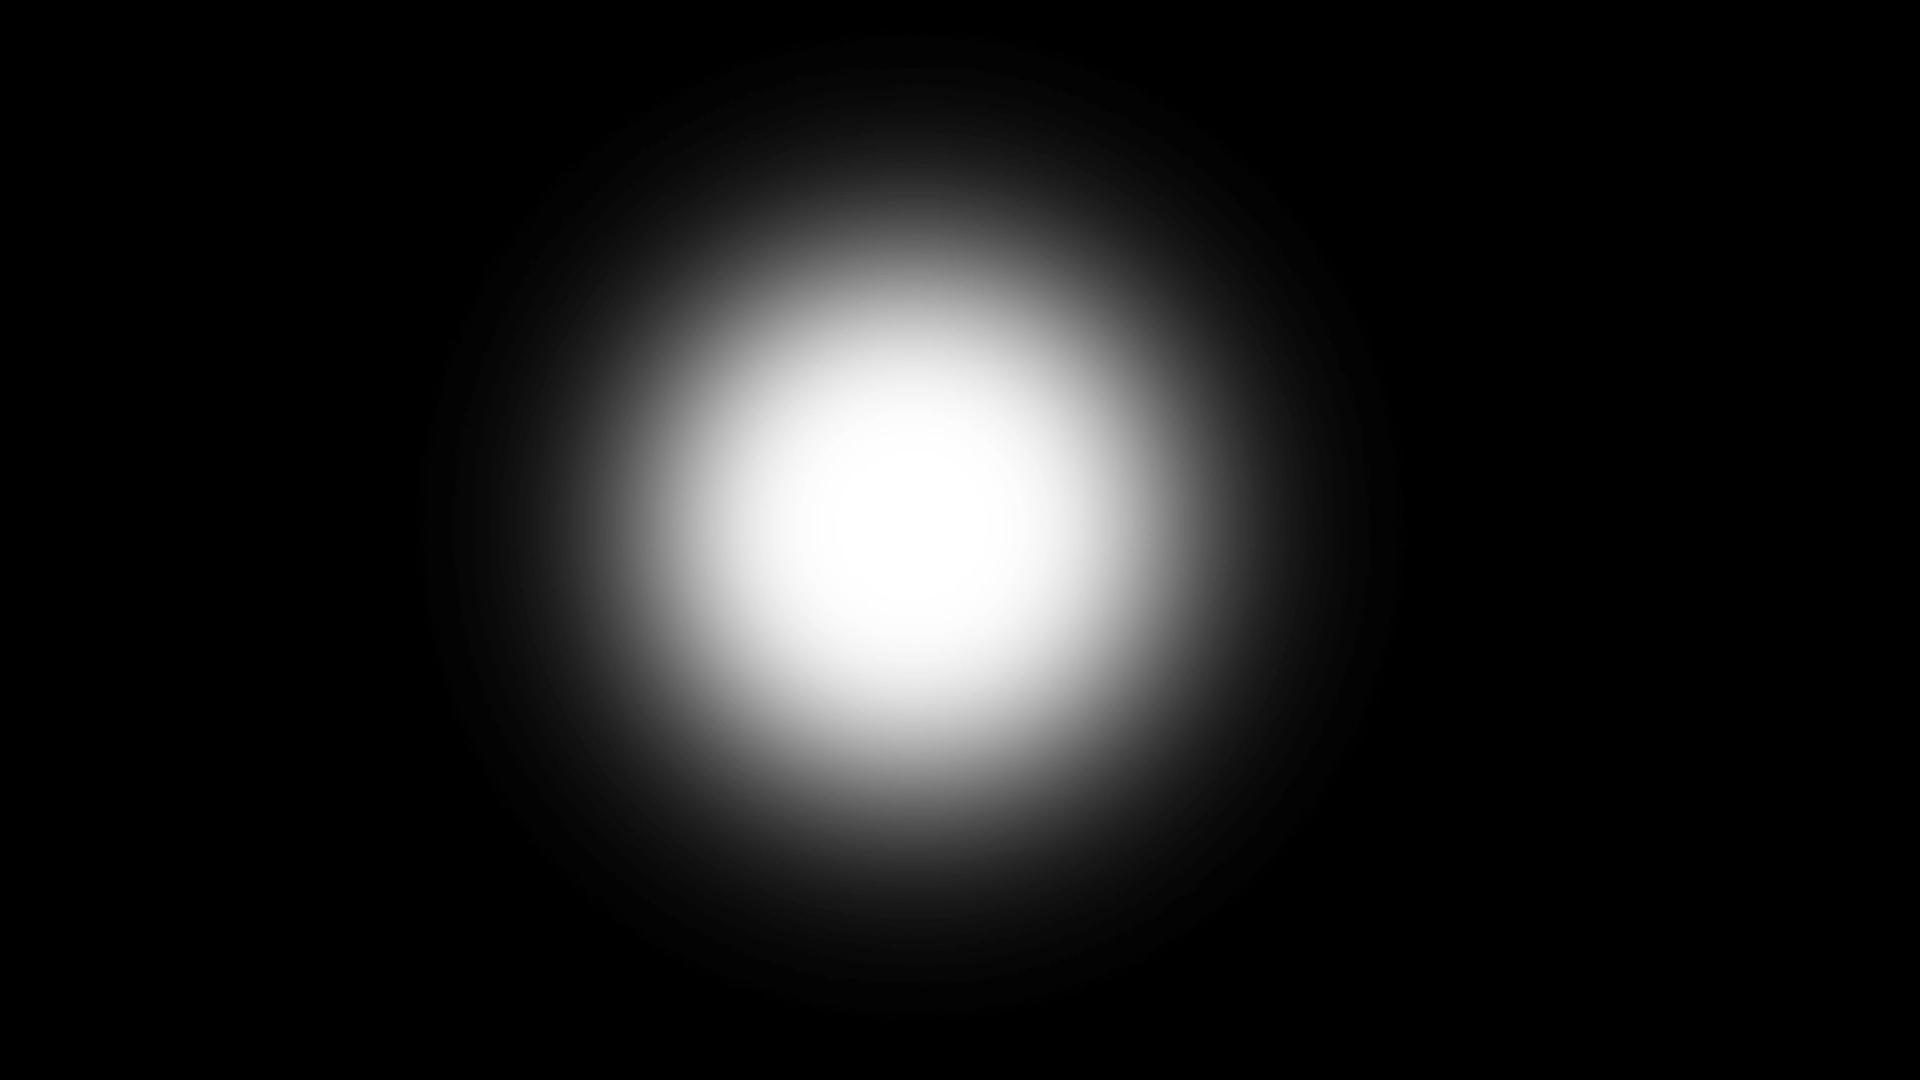 TORCH / 17987162521 METERS IN 1 MINUTE HD-video, no sound, 1 minute/loop, (still).